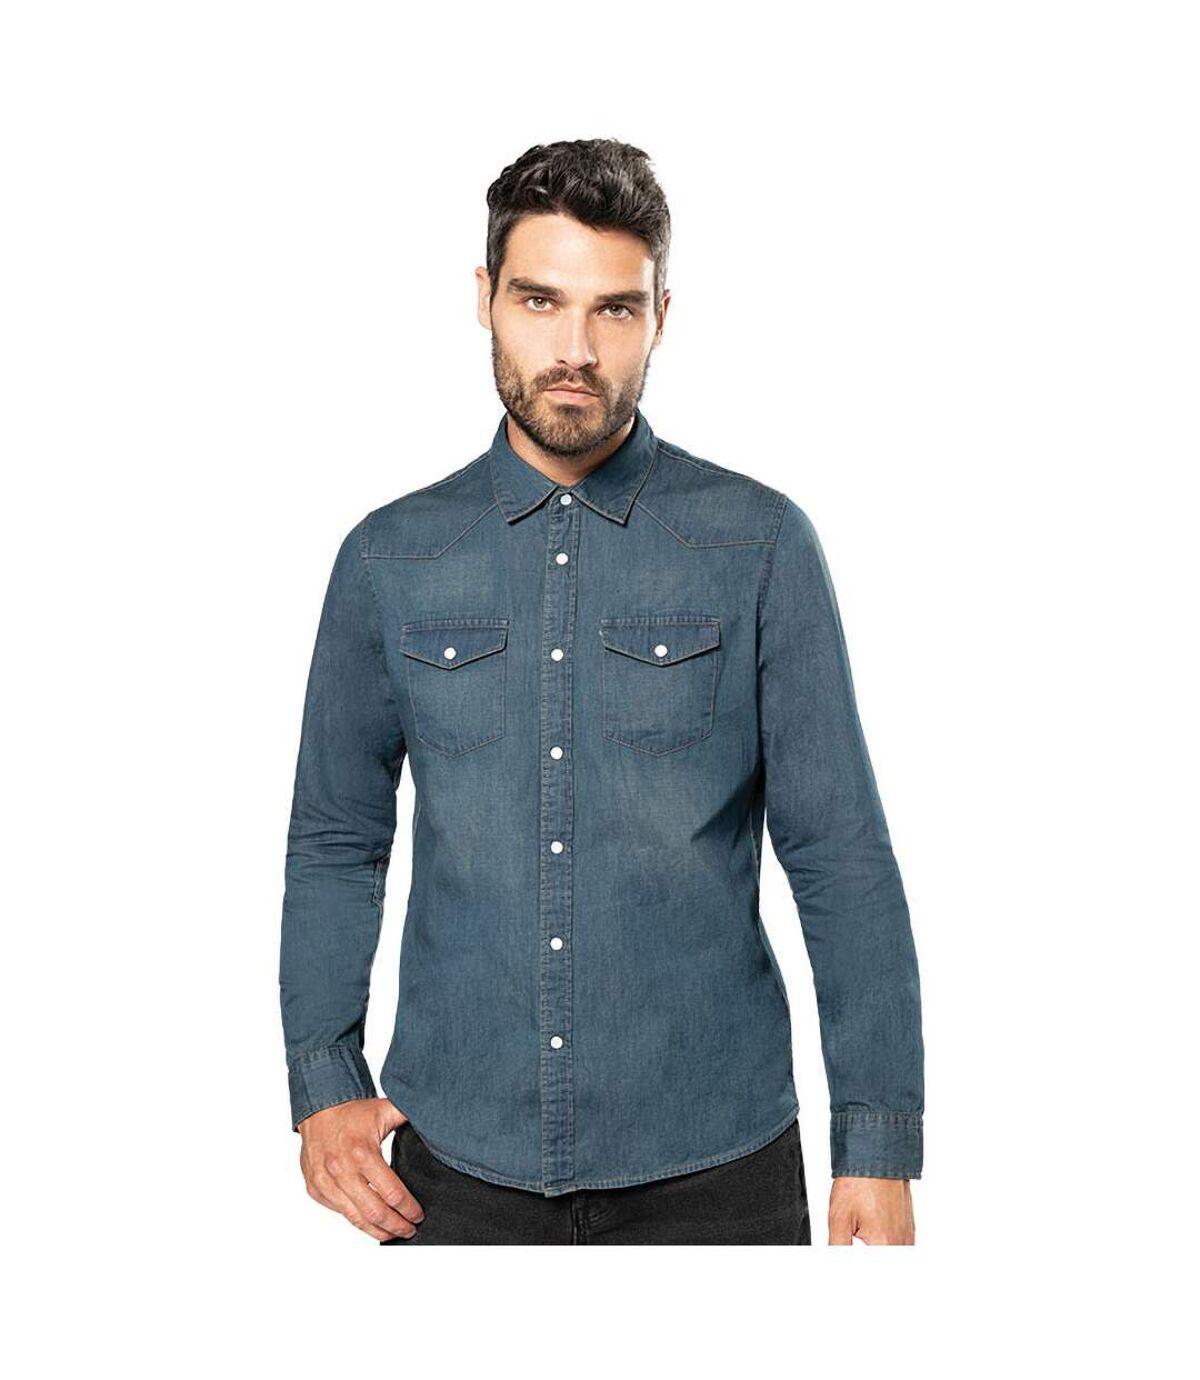 Kariban Mens Long Sleeve Casual Denim Shirt (Blue Jean) - UTRW4216